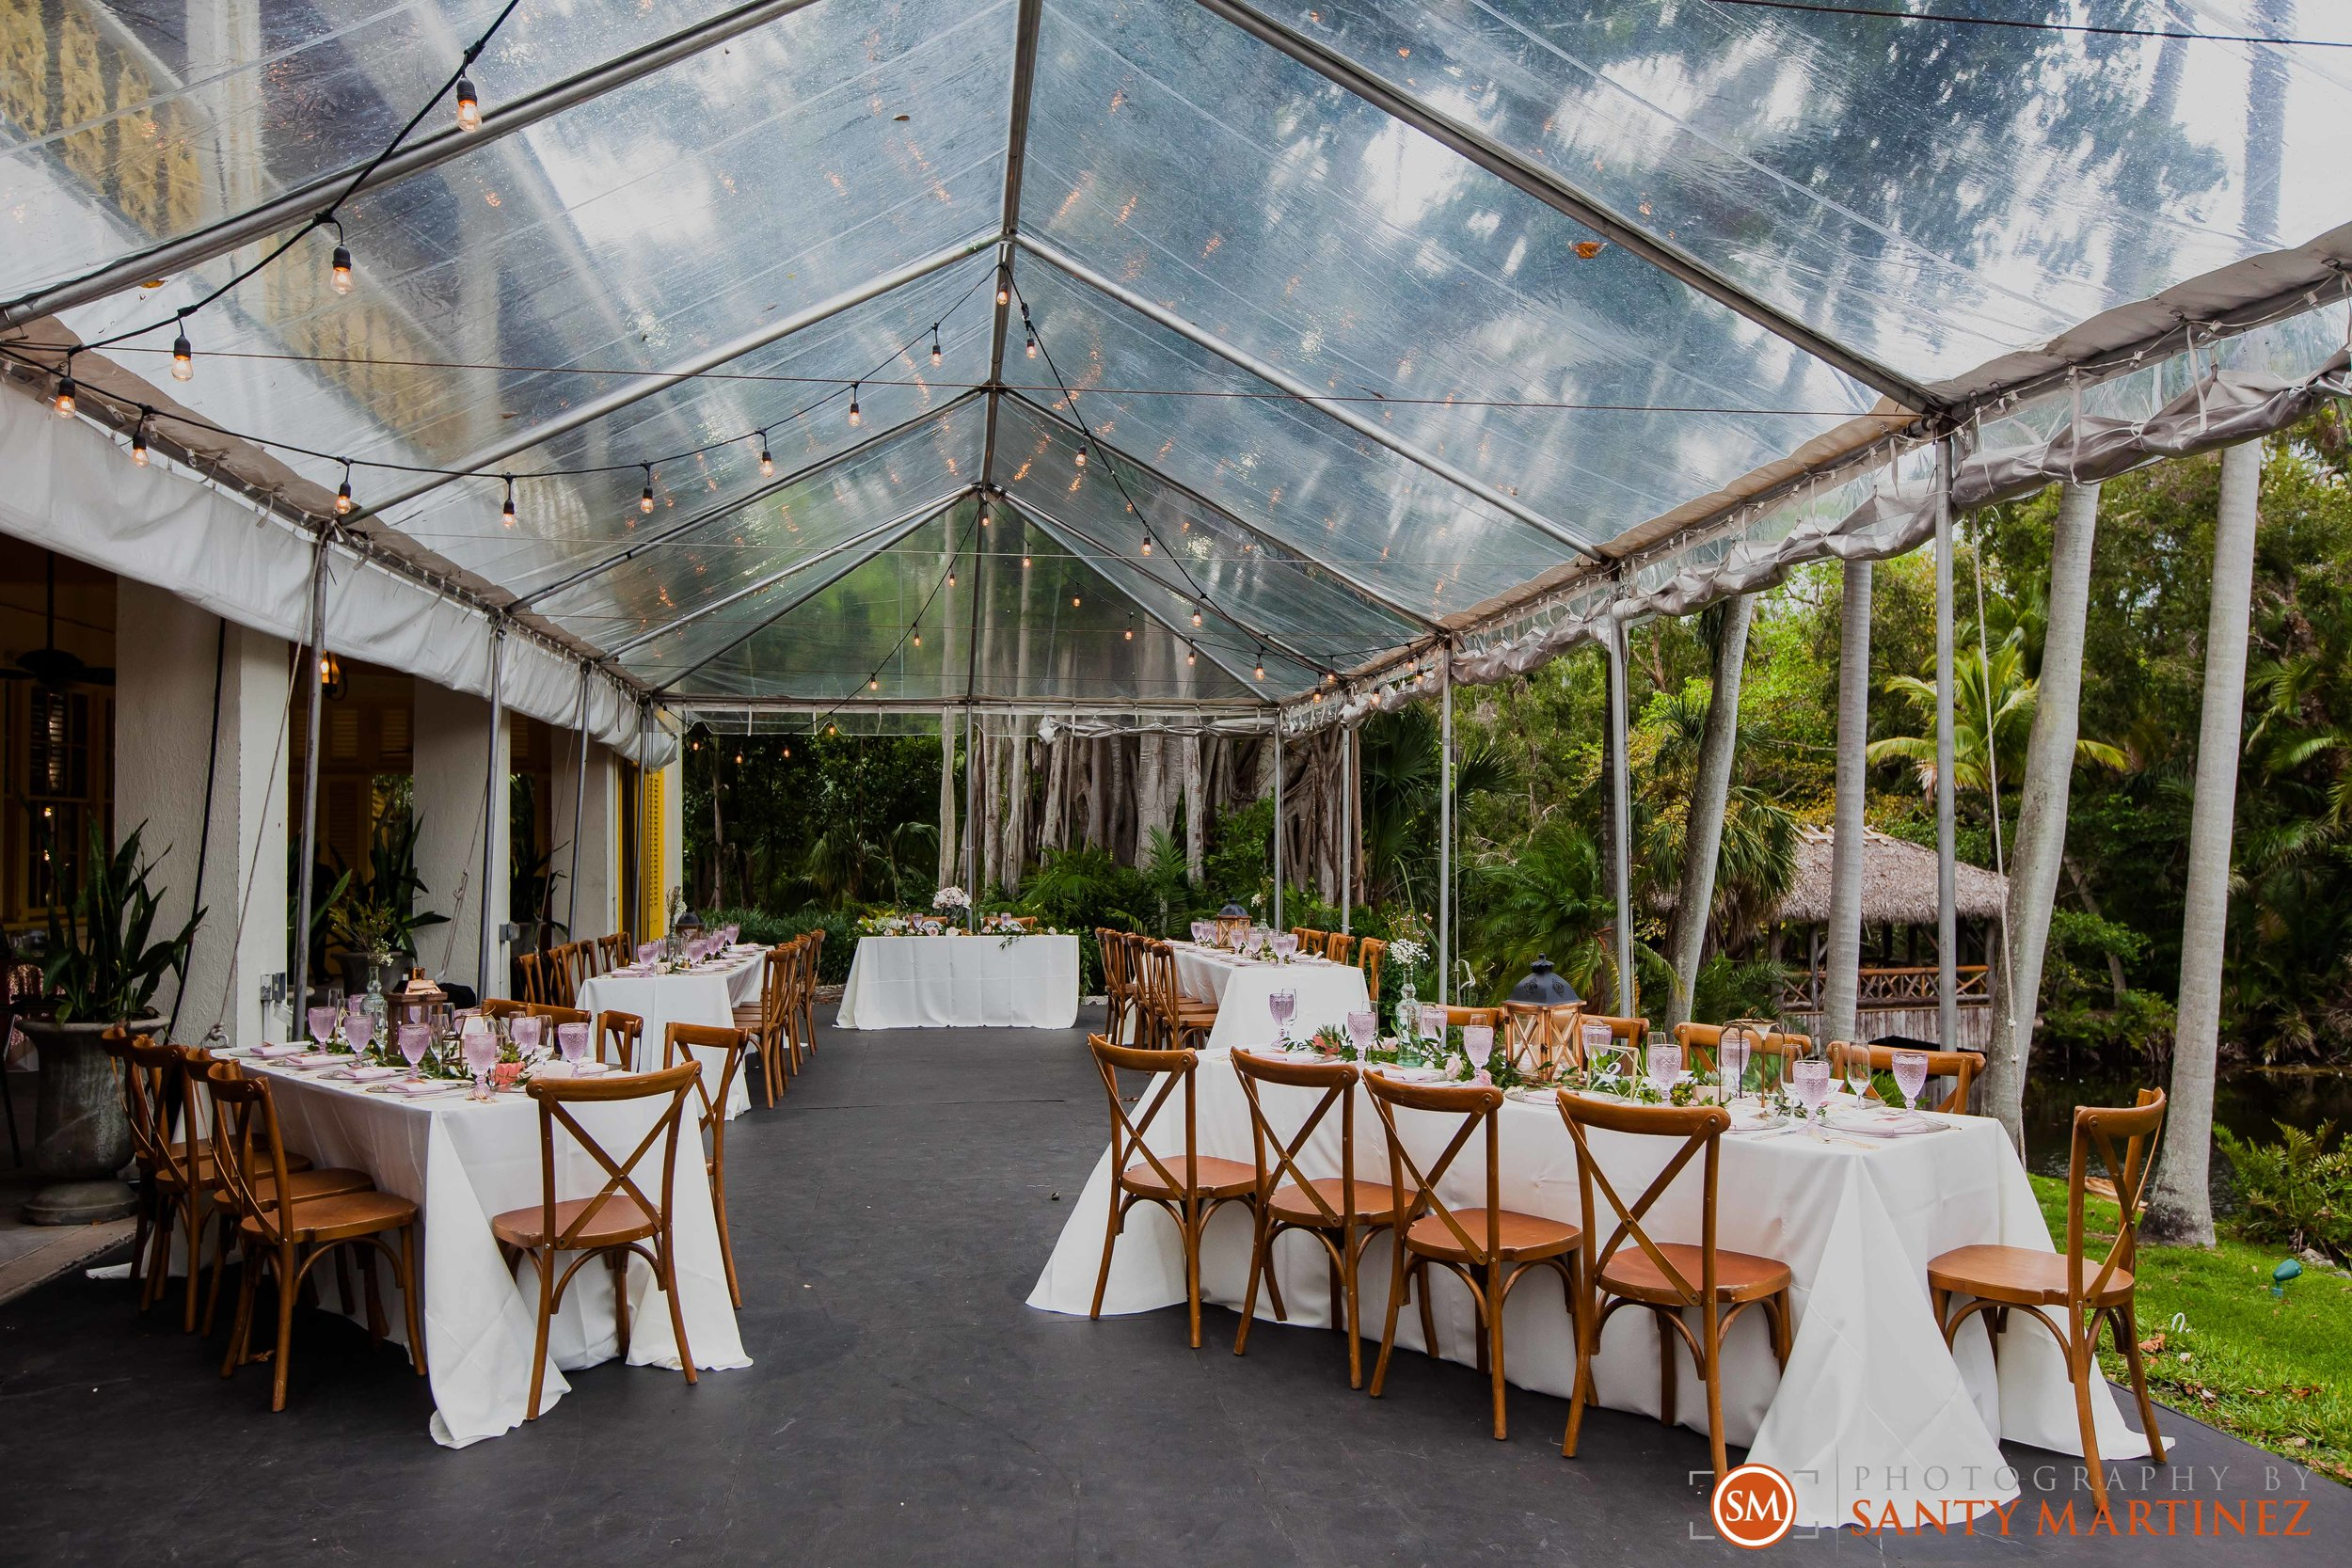 Wedding Bonnet House - Santy Martinez Photography-49.jpg